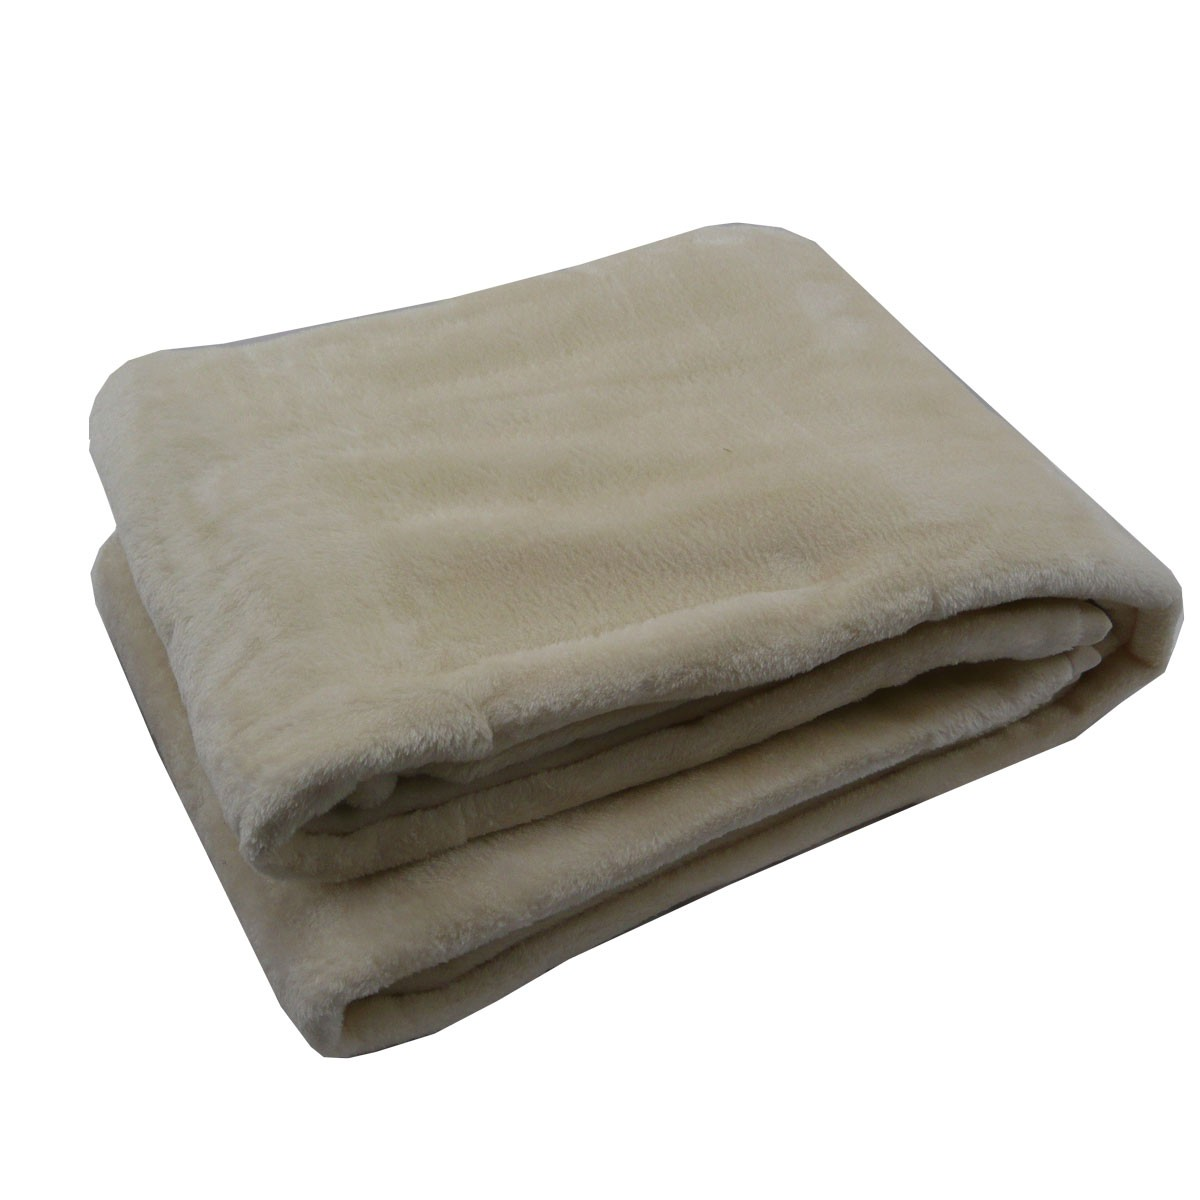 fleece decke kuscheldecke flauschdecke creme 150x200cm. Black Bedroom Furniture Sets. Home Design Ideas